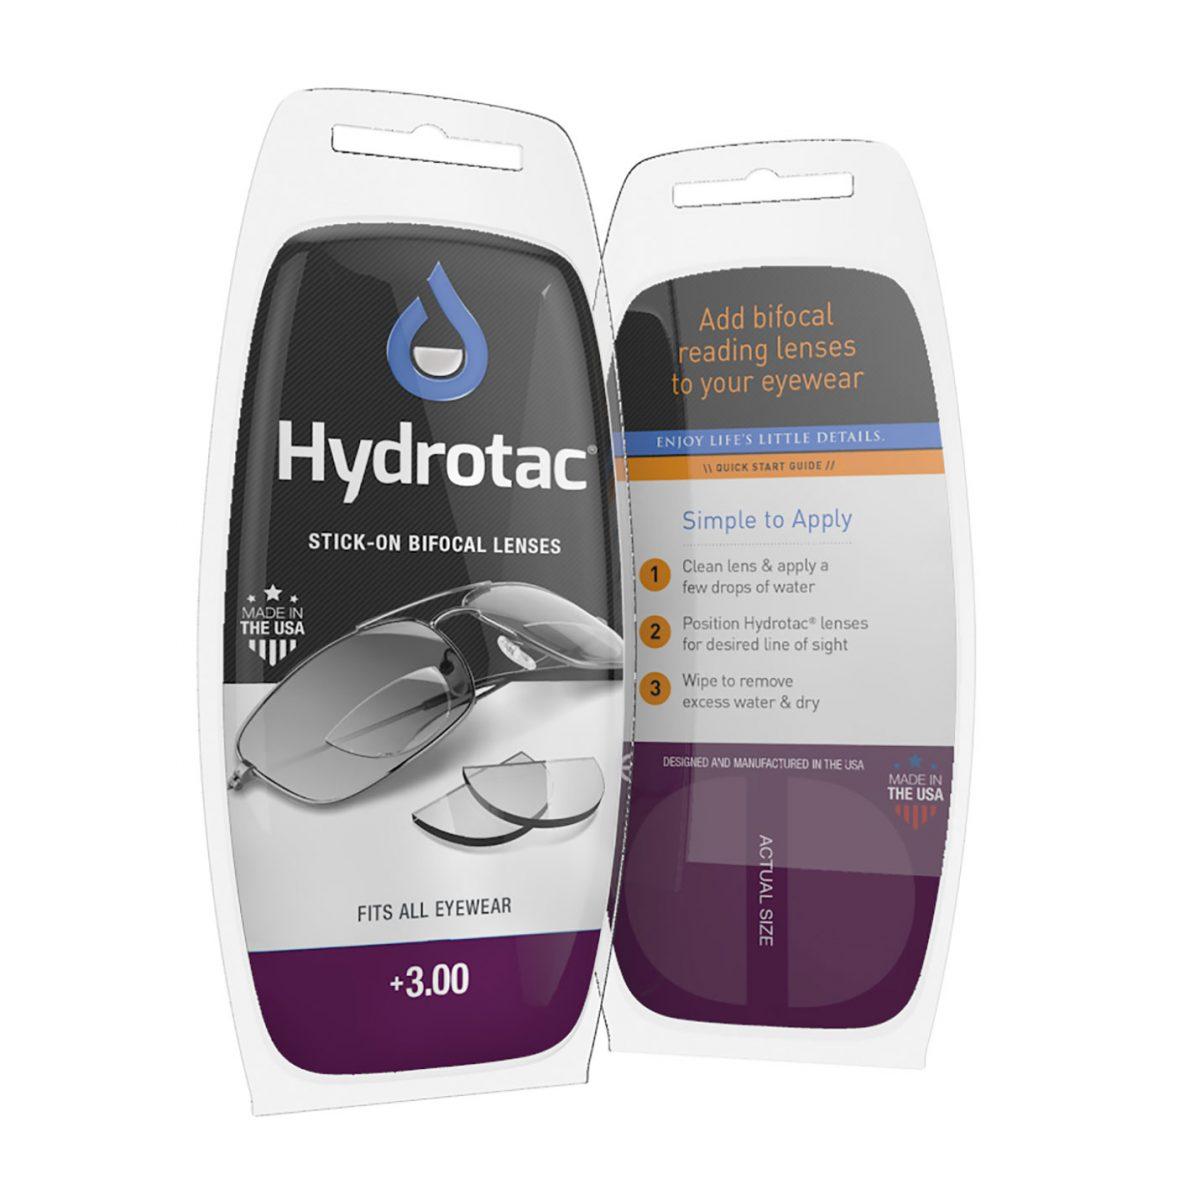 Hydrotac Stick-On Bifocal Lenses